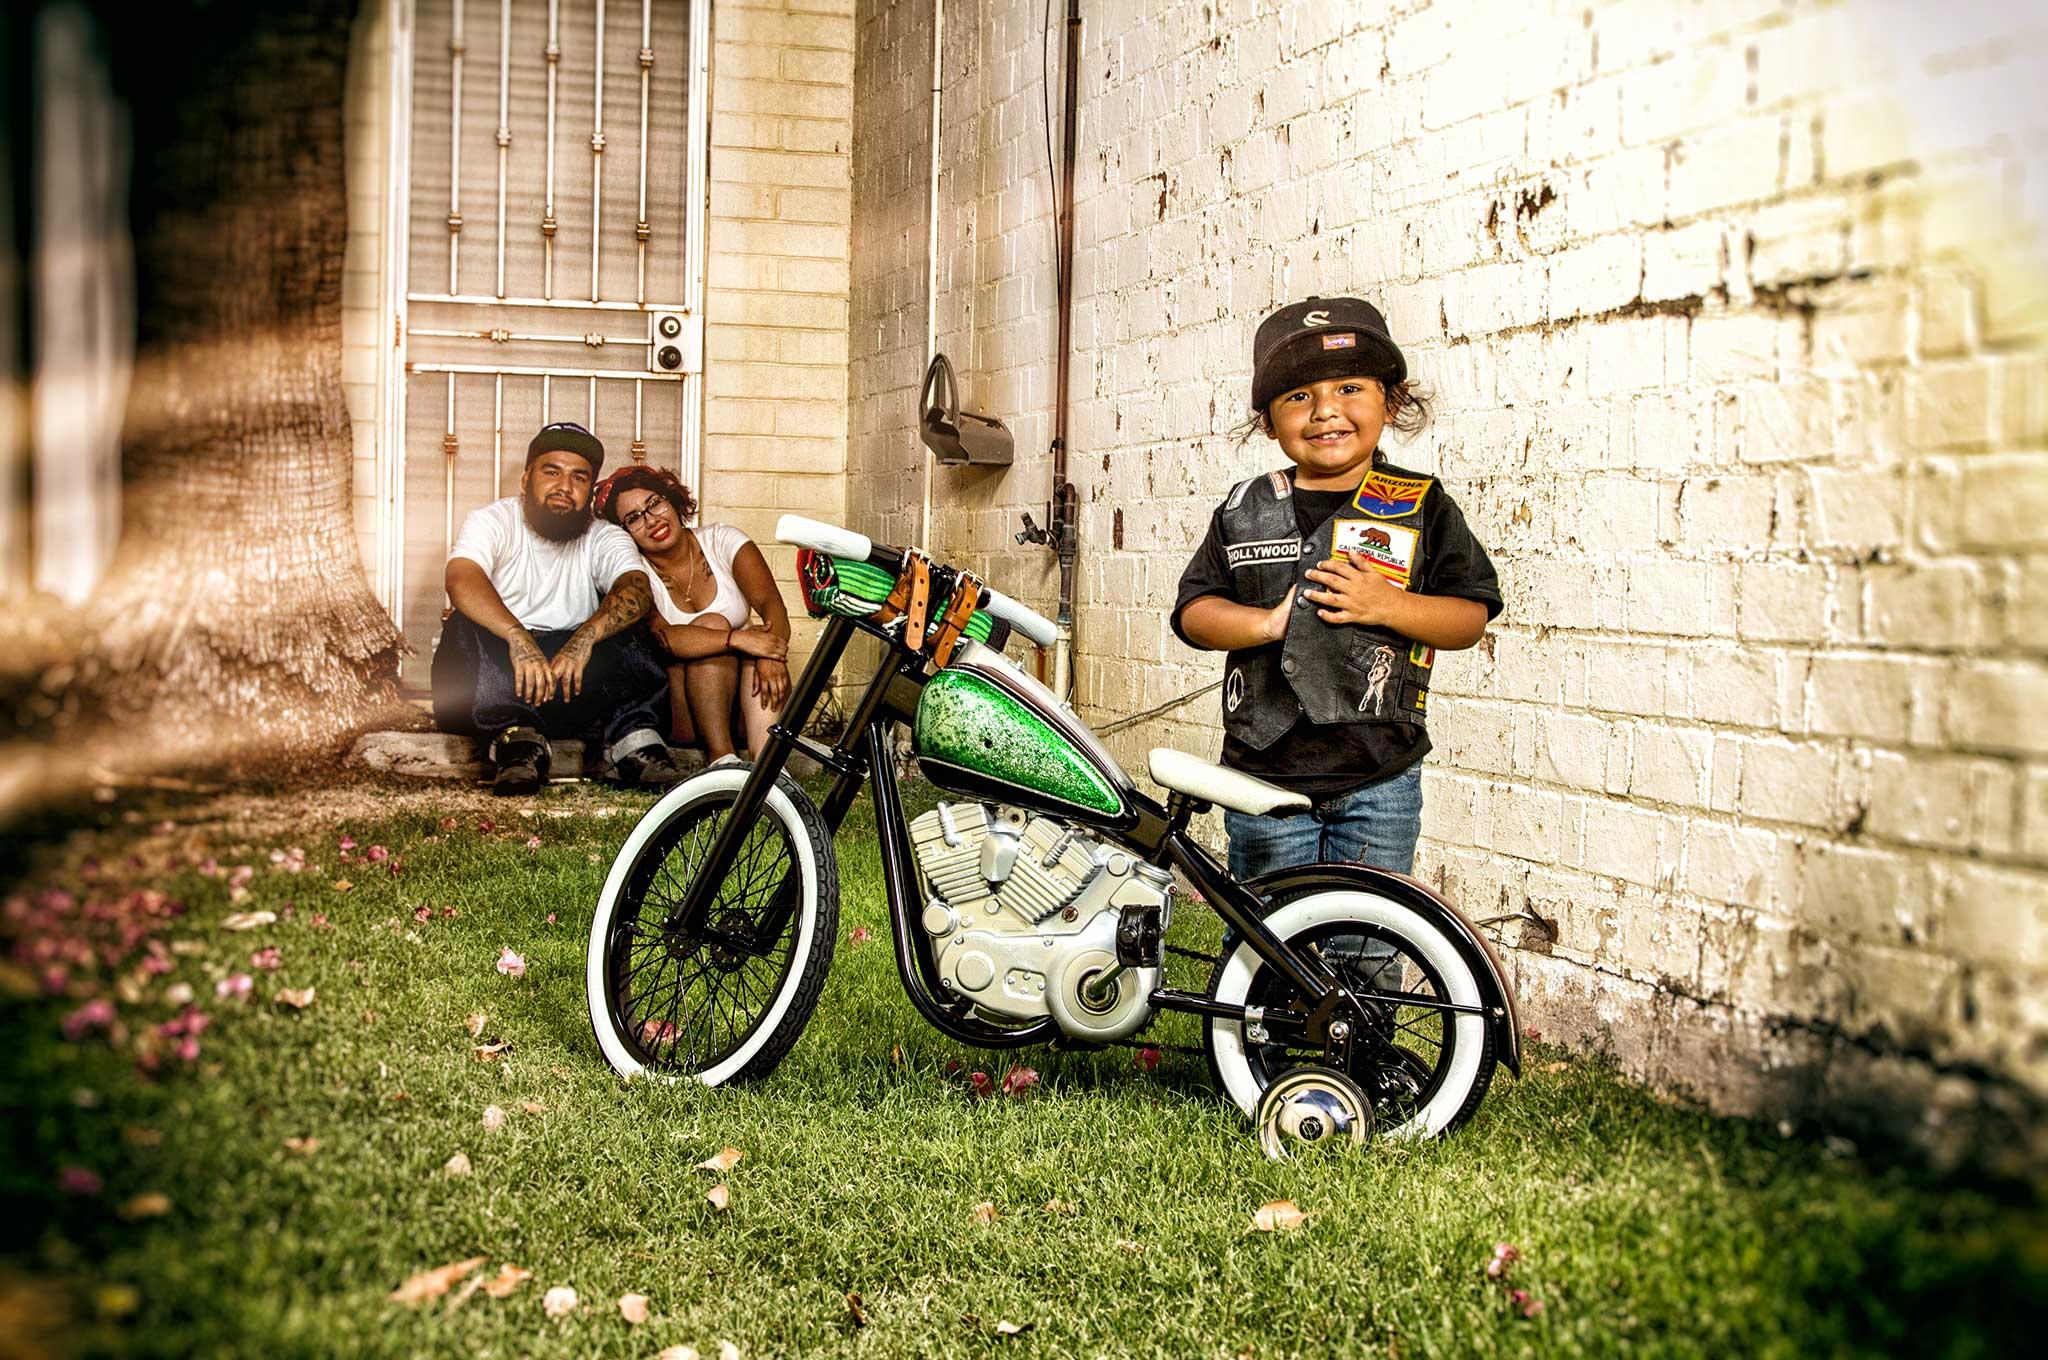 Harley Davidson Kid Bike Like Dad S Harley Lowrider